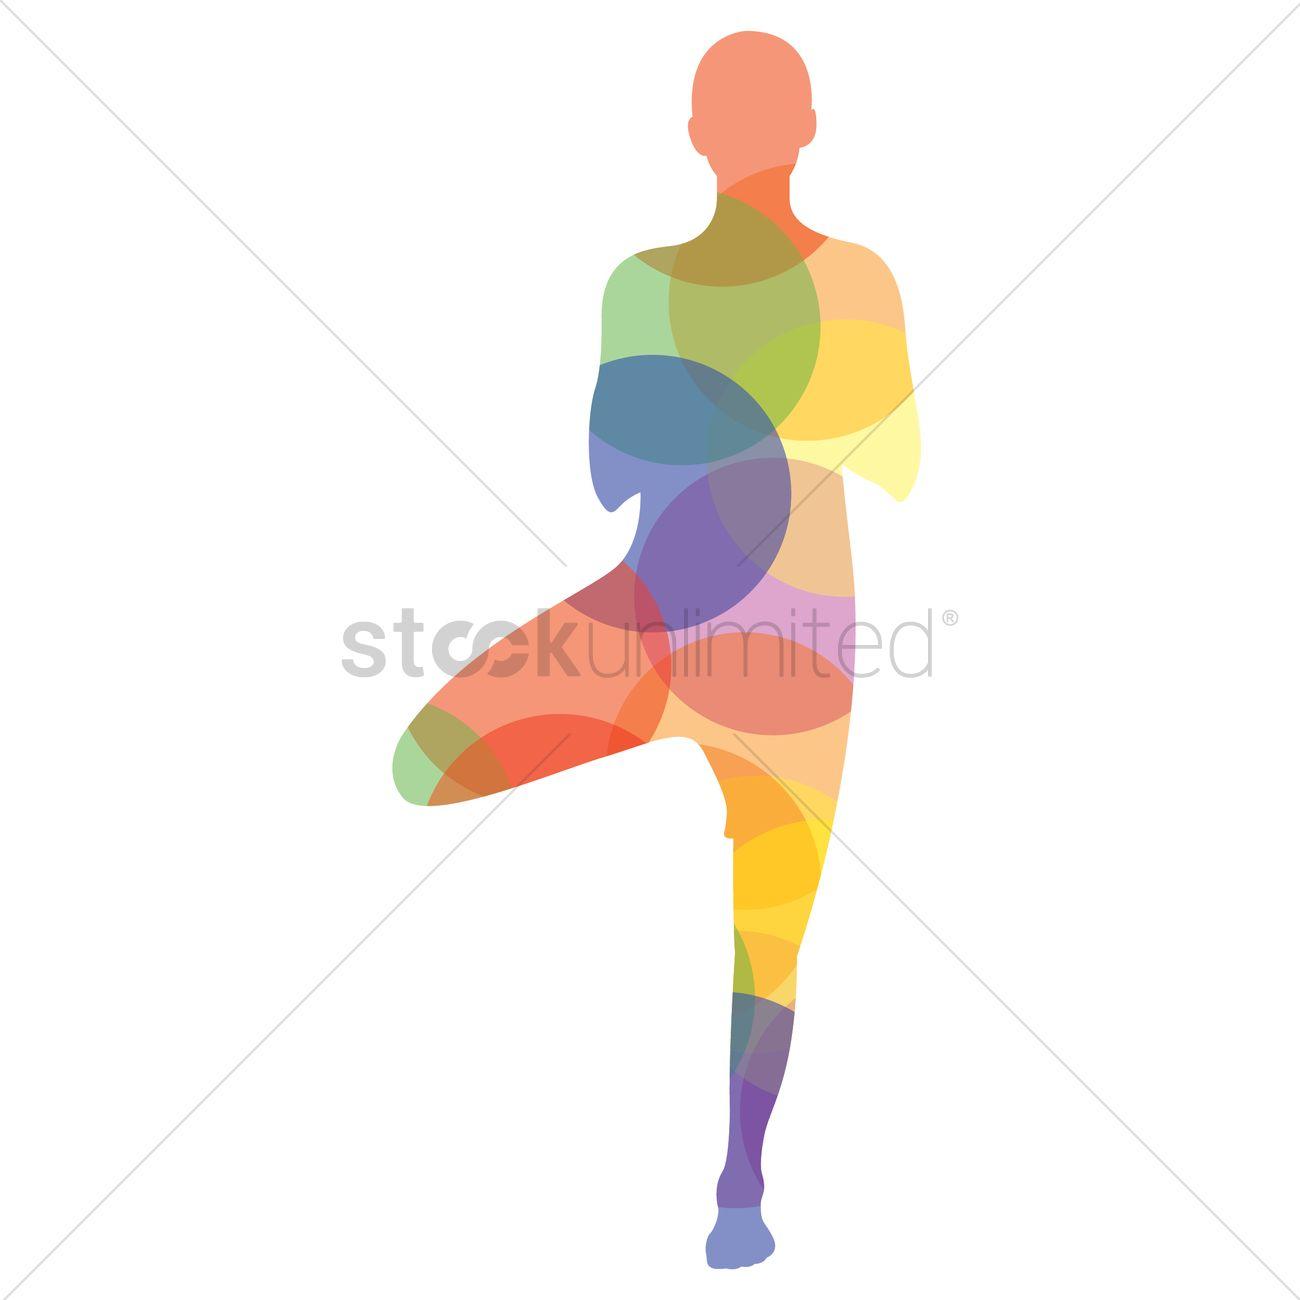 Man Silhouette Practising Yoga In Tree Pose Vector Graphic